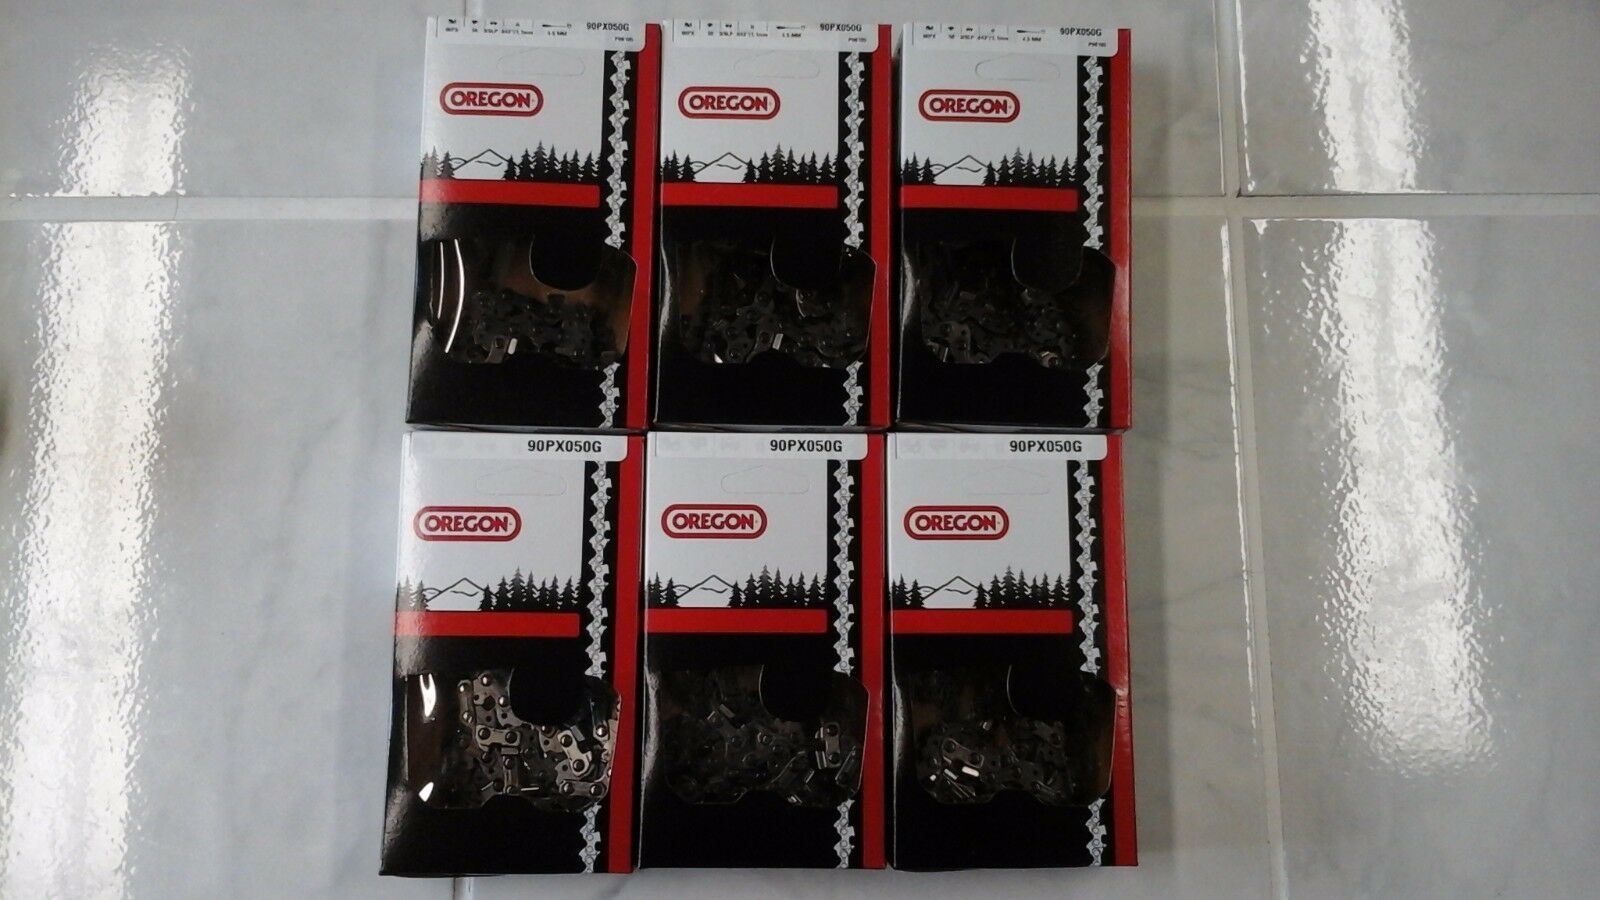 6 cadenas de motosierra 90PX050G Oregon 14  3 8 Lp .043 50 DL ajusta MS171 MS 181 Sierra